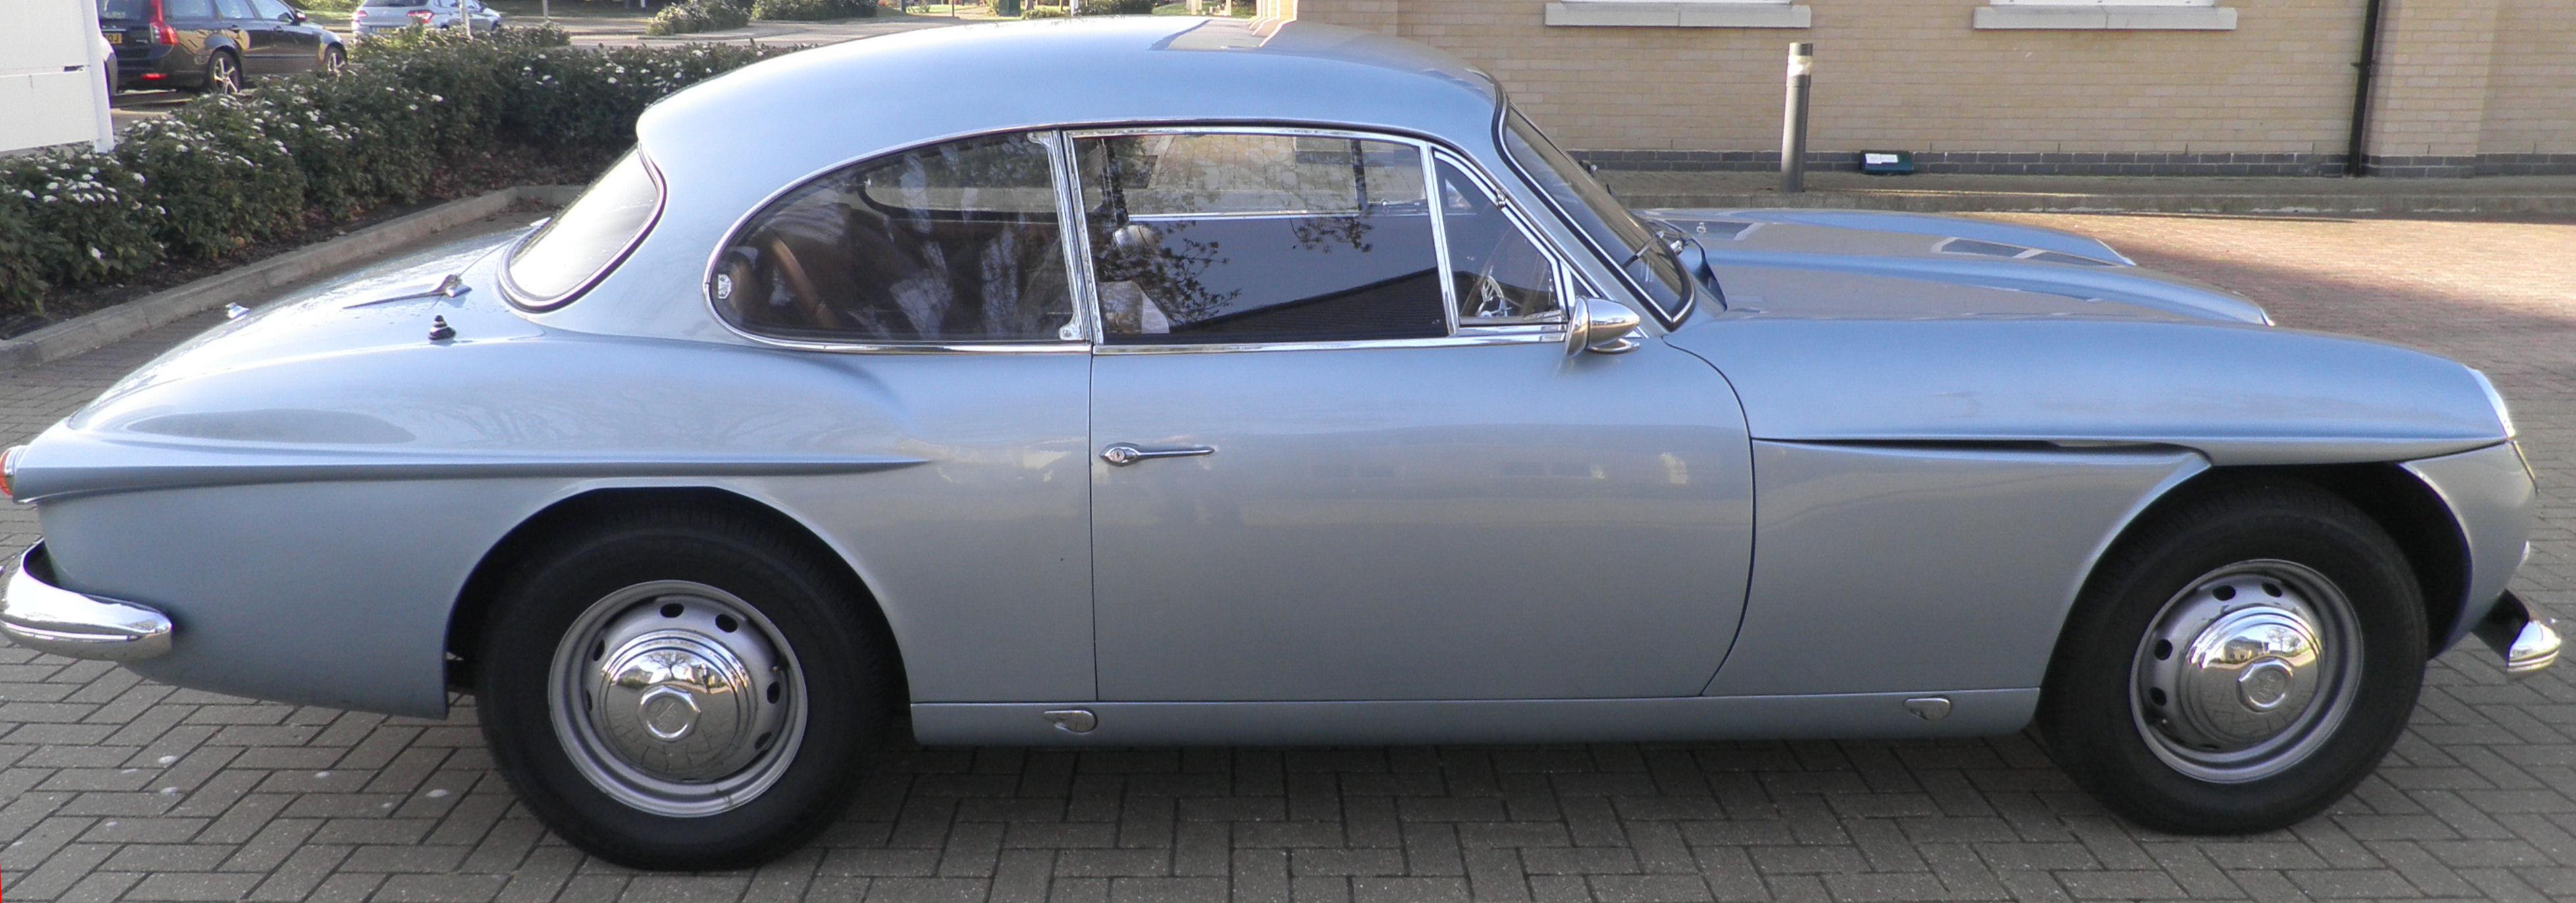 Jensen C-V8 Silver